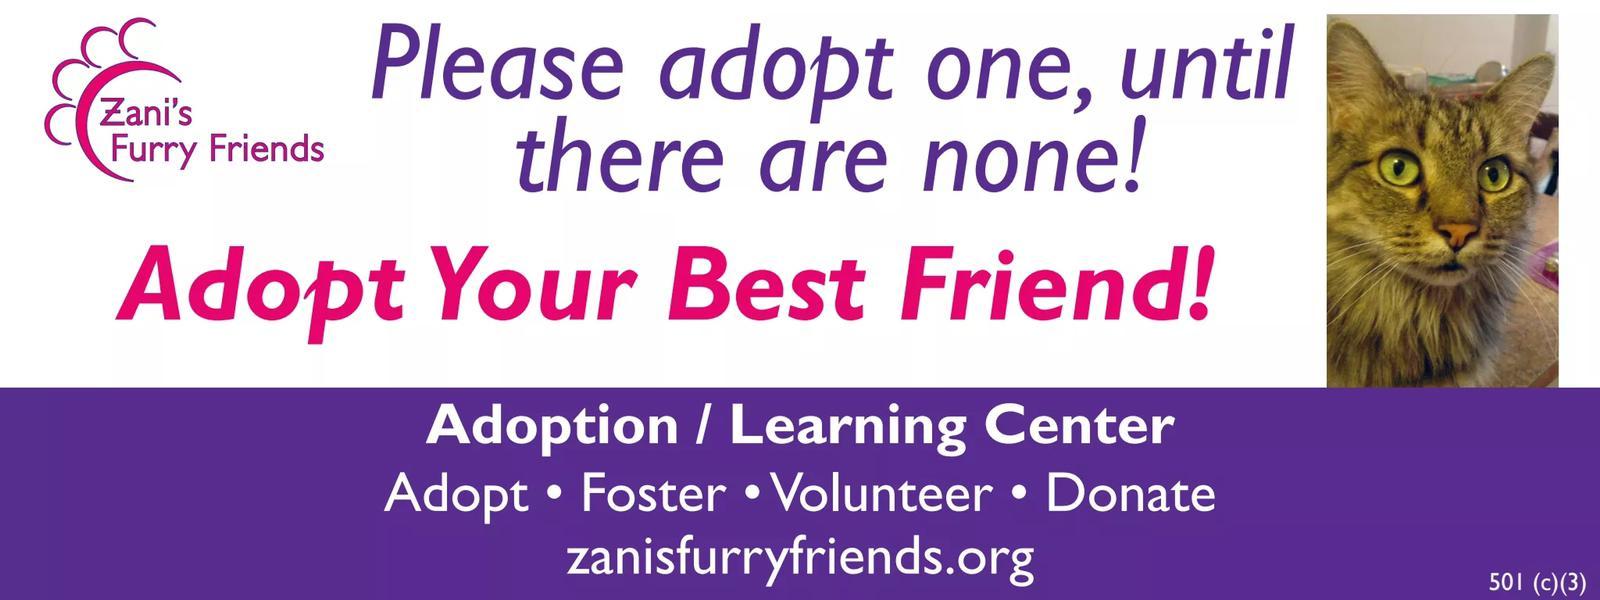 Adoption Center Poster